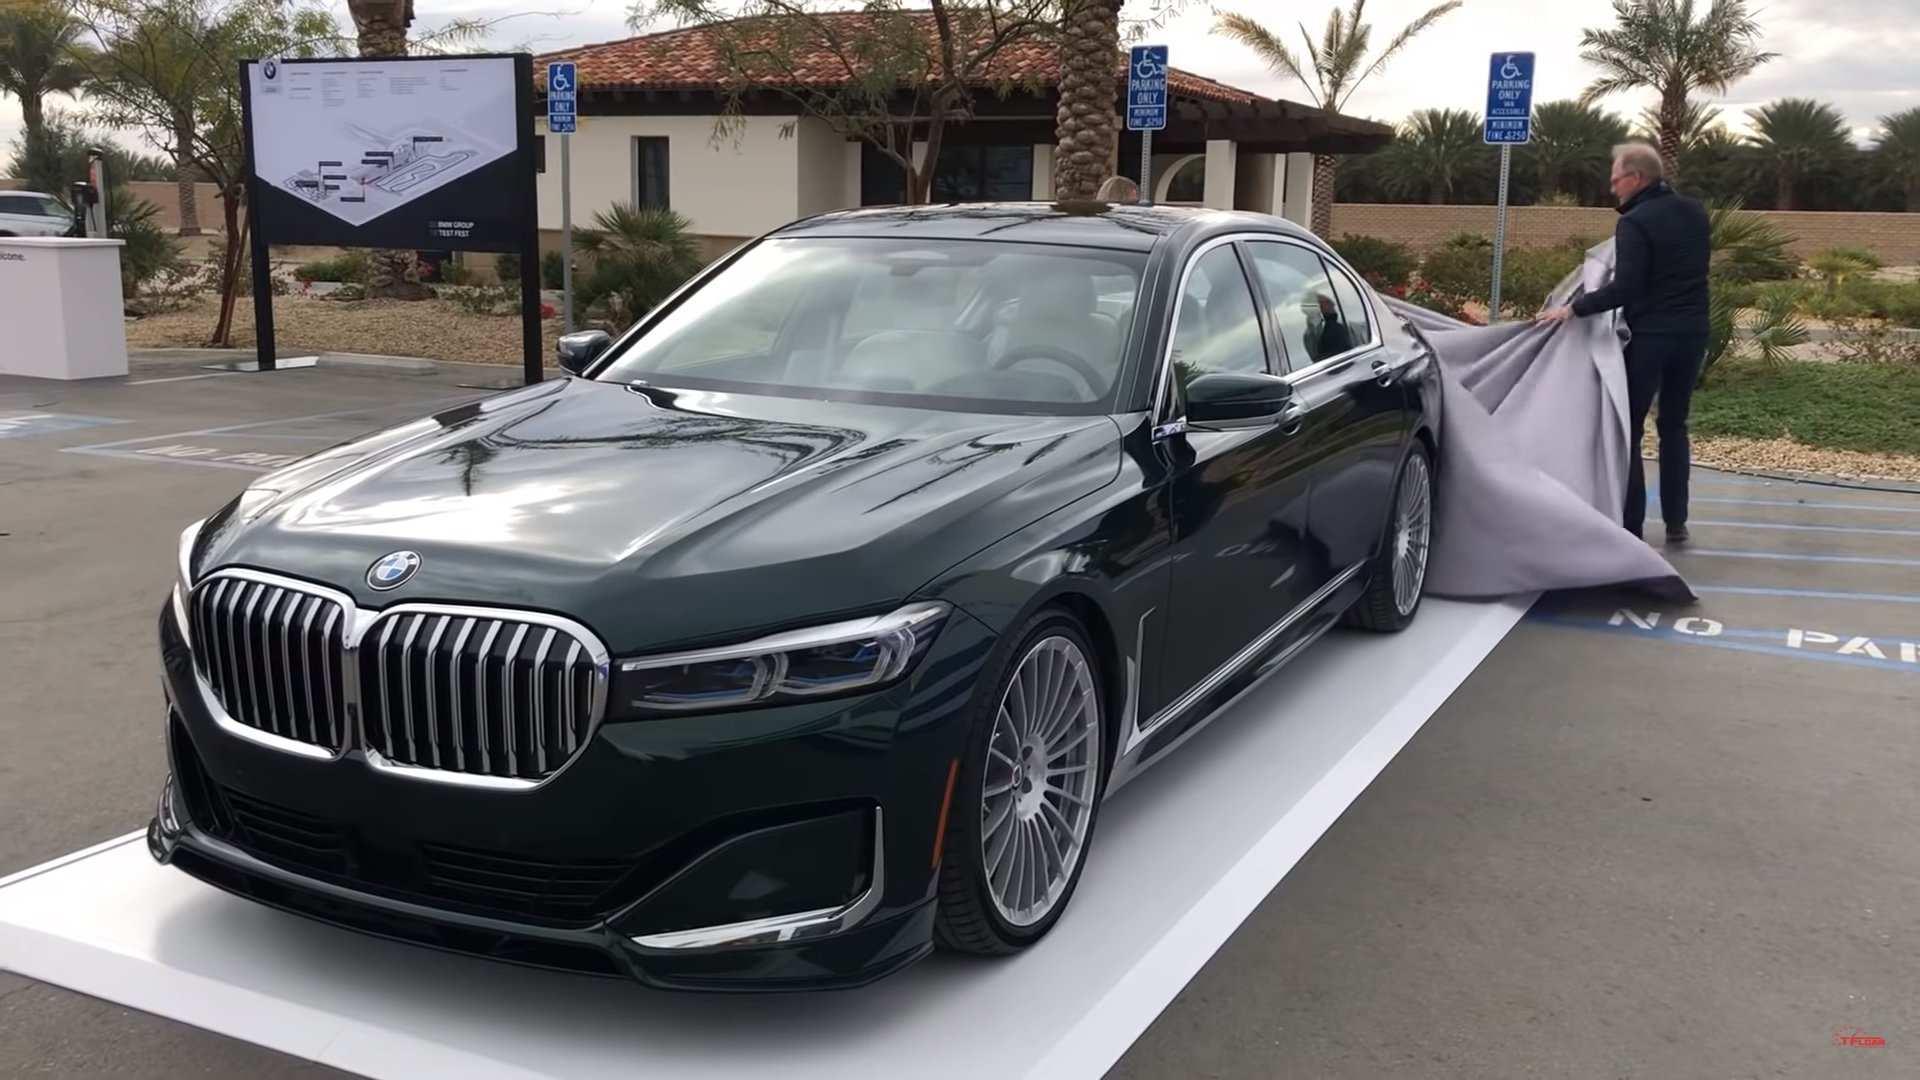 57 Best Review BMW Alpina B7 2020 Price Interior with BMW Alpina B7 2020 Price